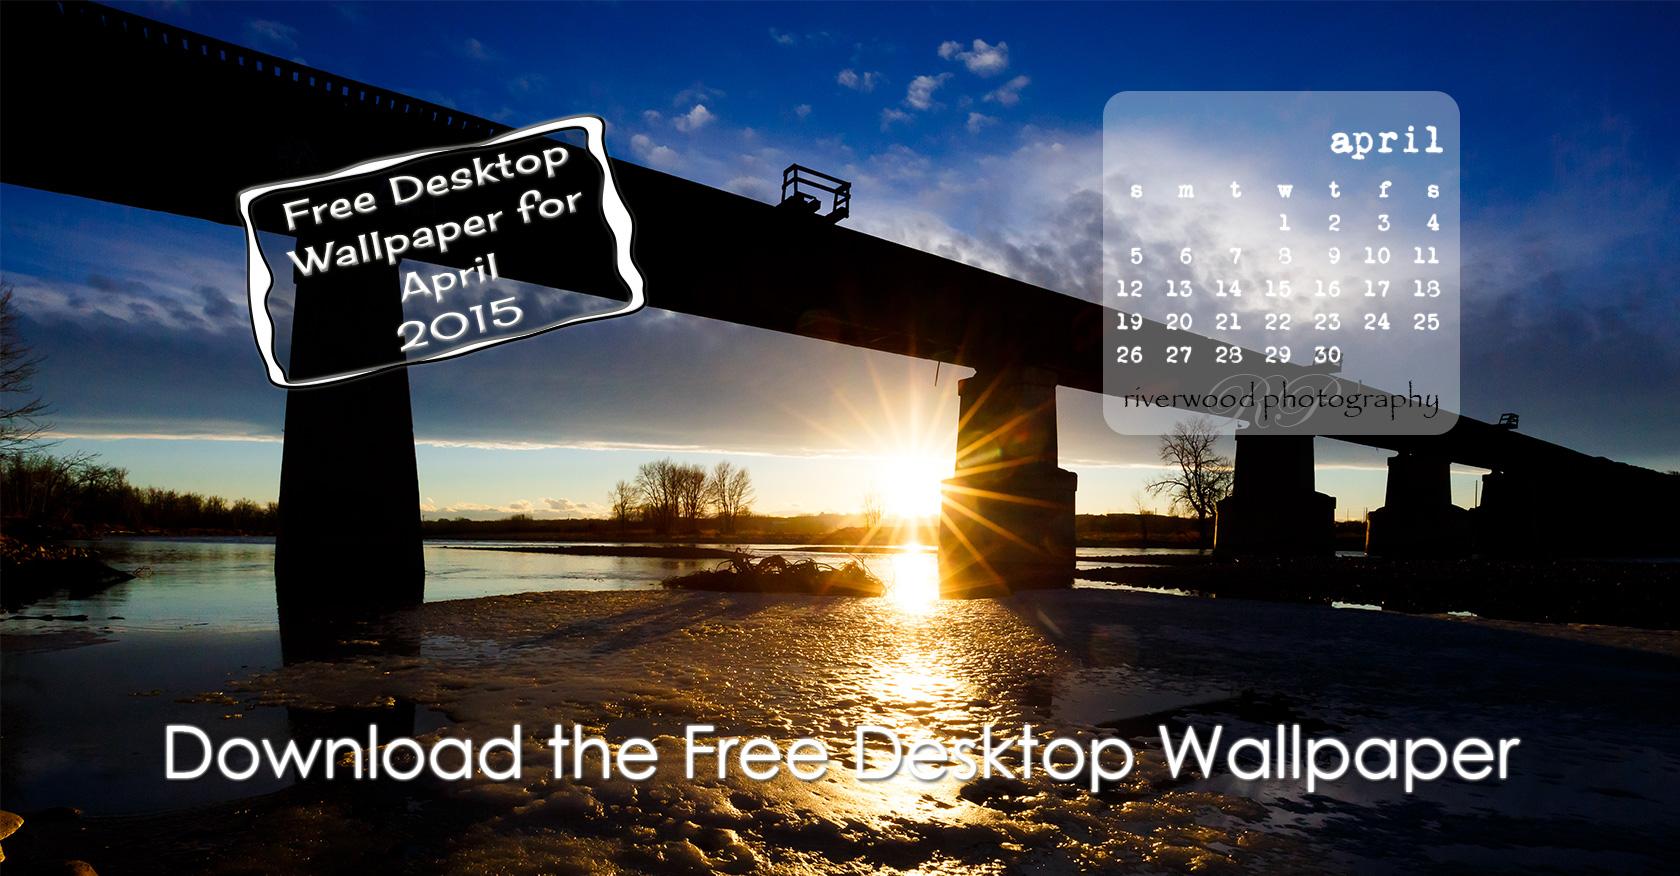 Free Desktop Wallpaper for April 2015